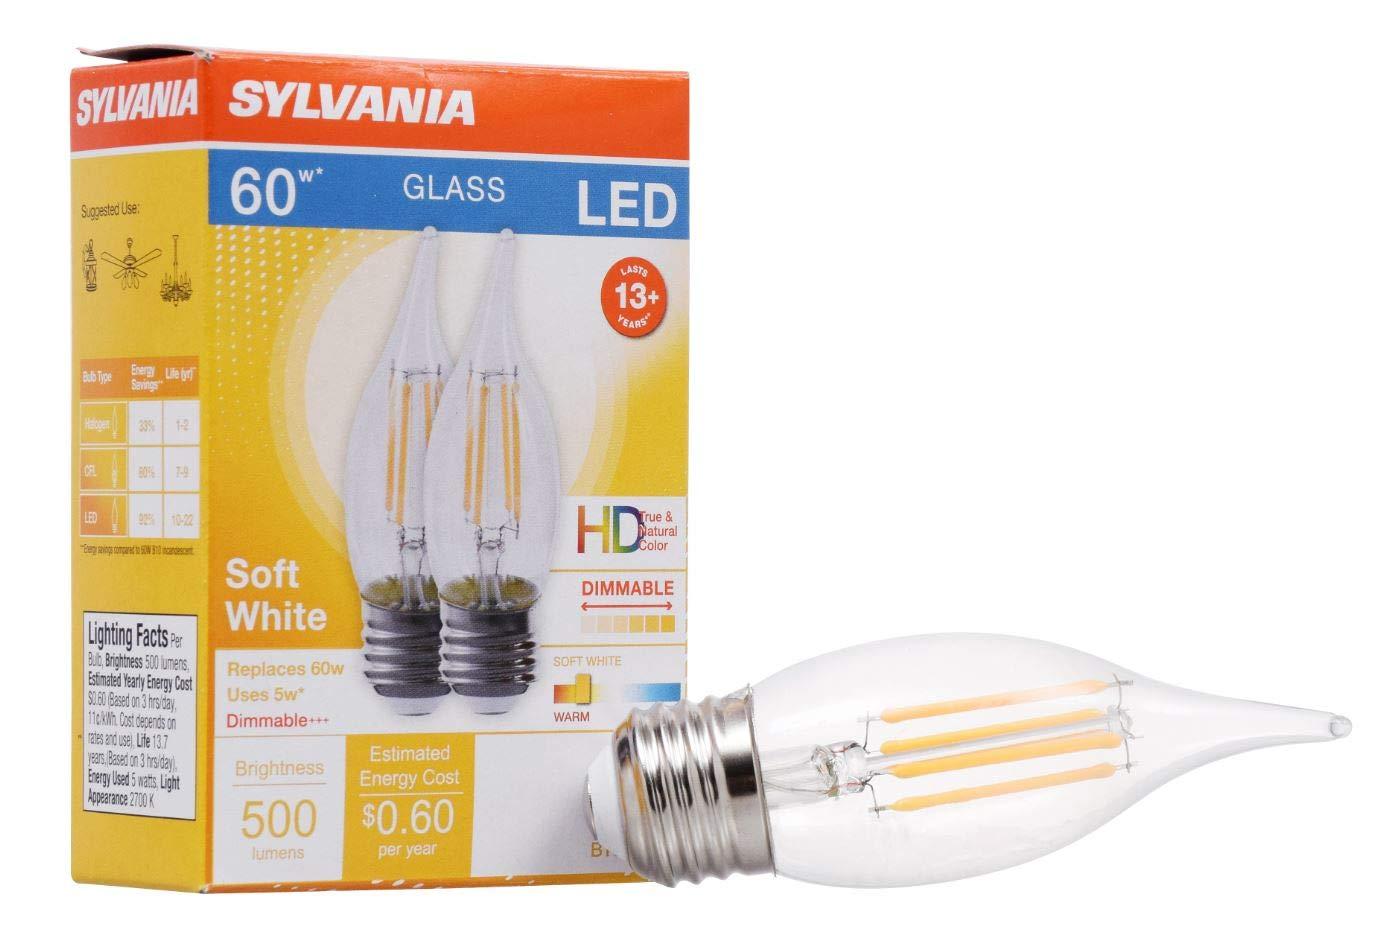 Sylvania 40404 LEDフィラメント電球 B10ランプ 並形口金 クリア仕上げ 効率的な5W ソフトホワイト 2700K 2個パック B07KK5TX6T